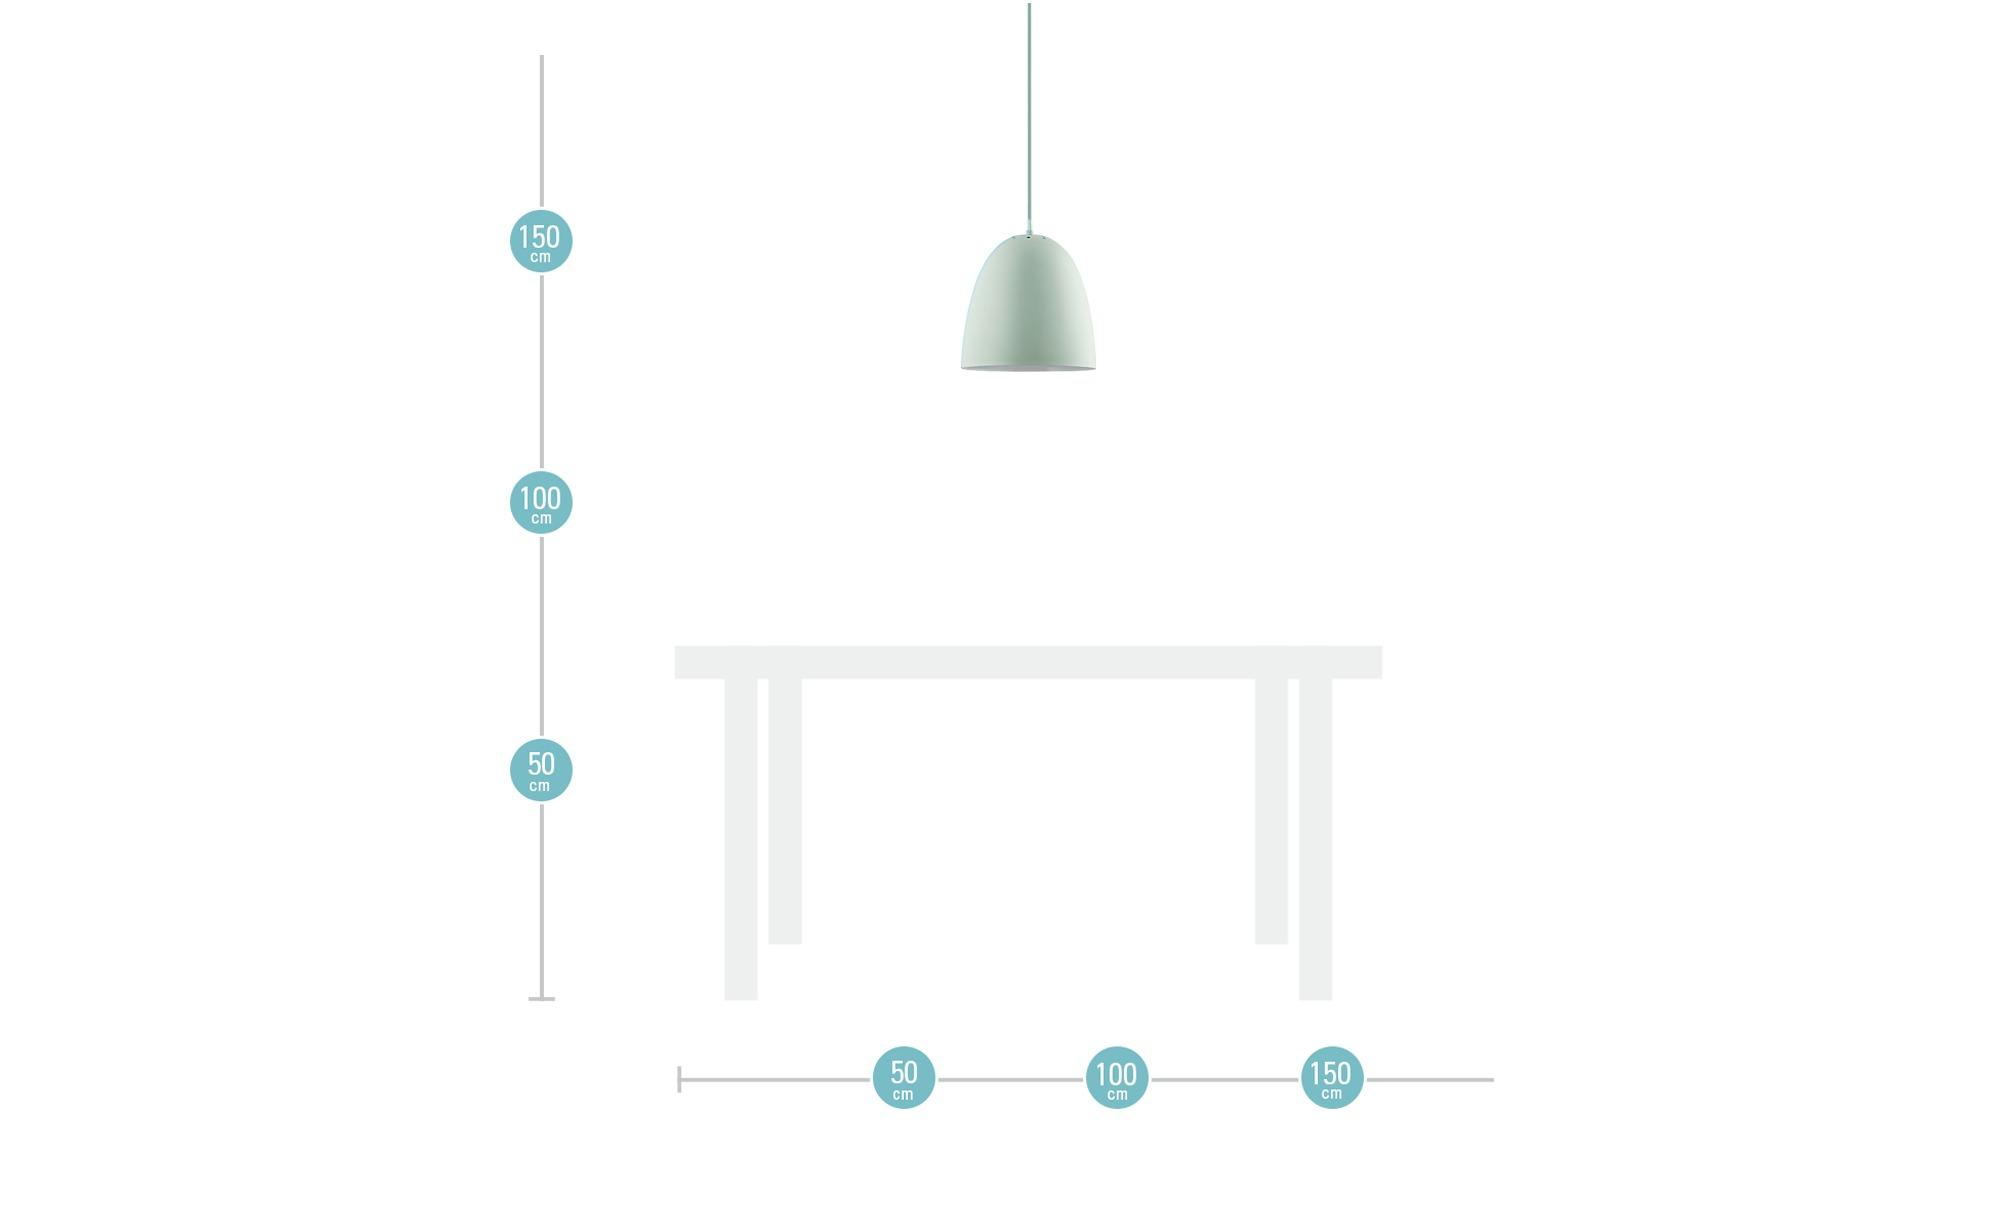 Pendelleuchte, 1-flammig, grün ¦ grün ¦ Maße (cm): H: 150 Ø: [30.0] Lampen & Leuchten > Innenleuchten > Pendelleuchten - Höffner